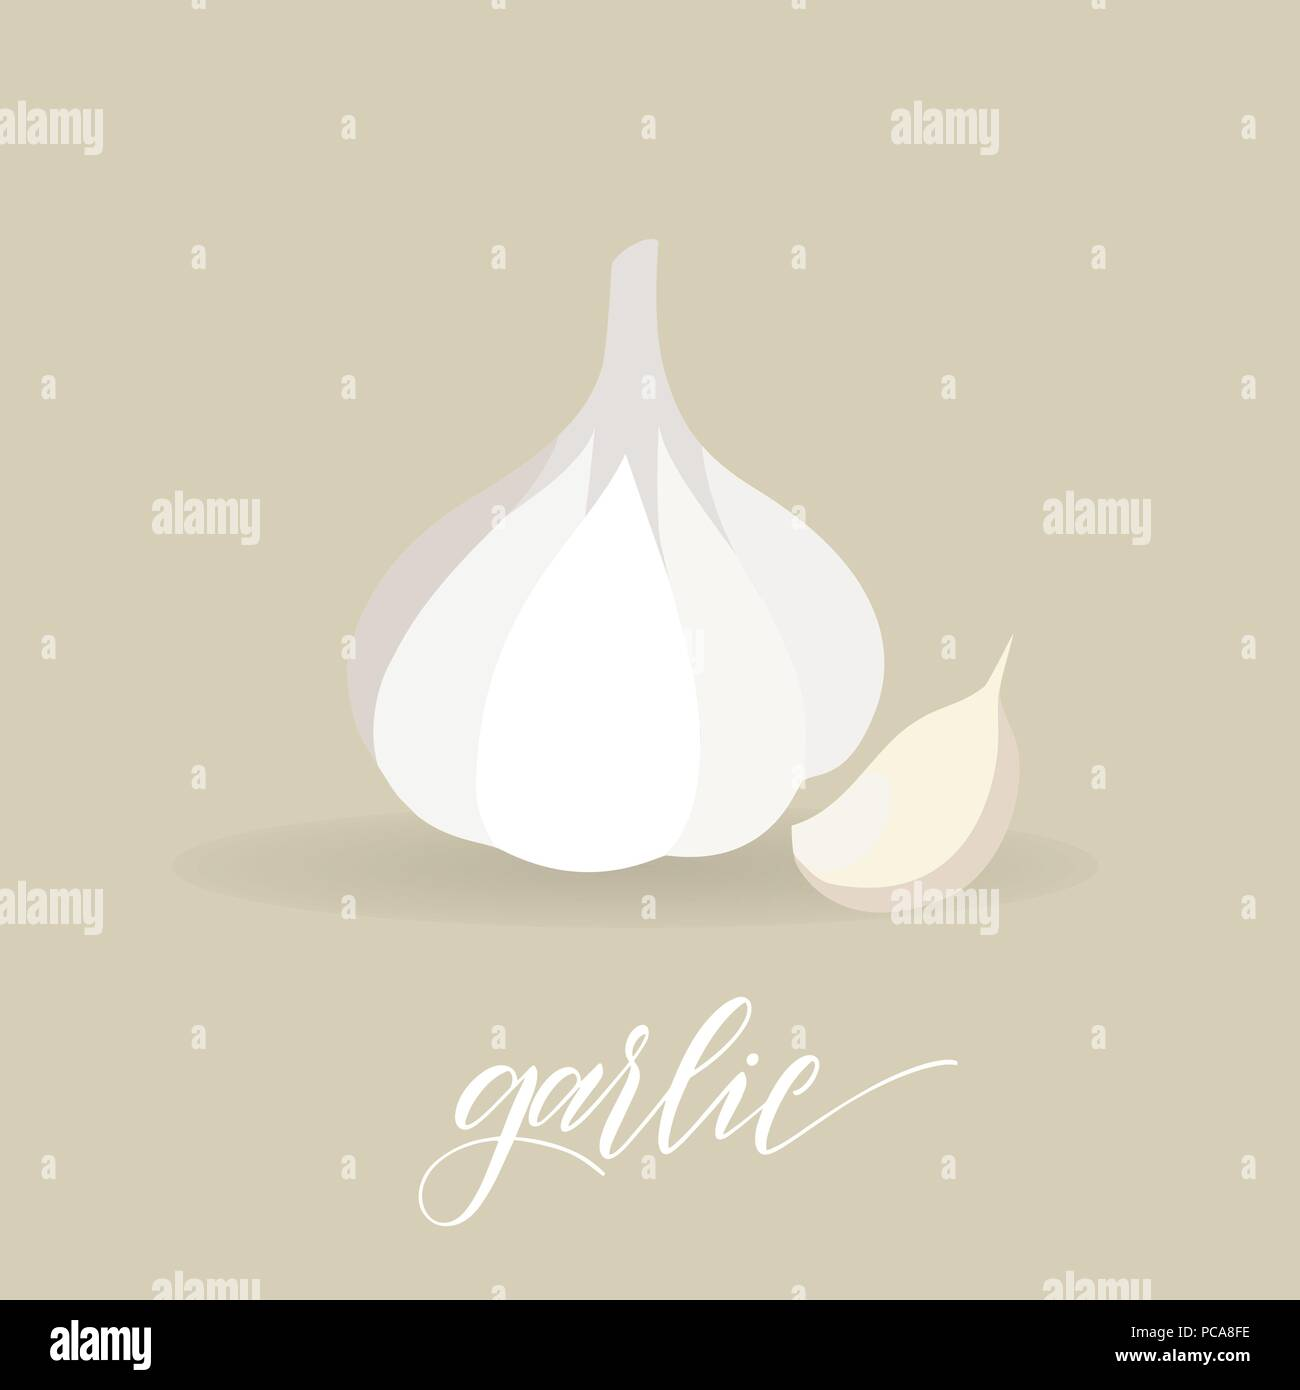 Garlic in flat style. Hand written text. Vector - Stock Vector